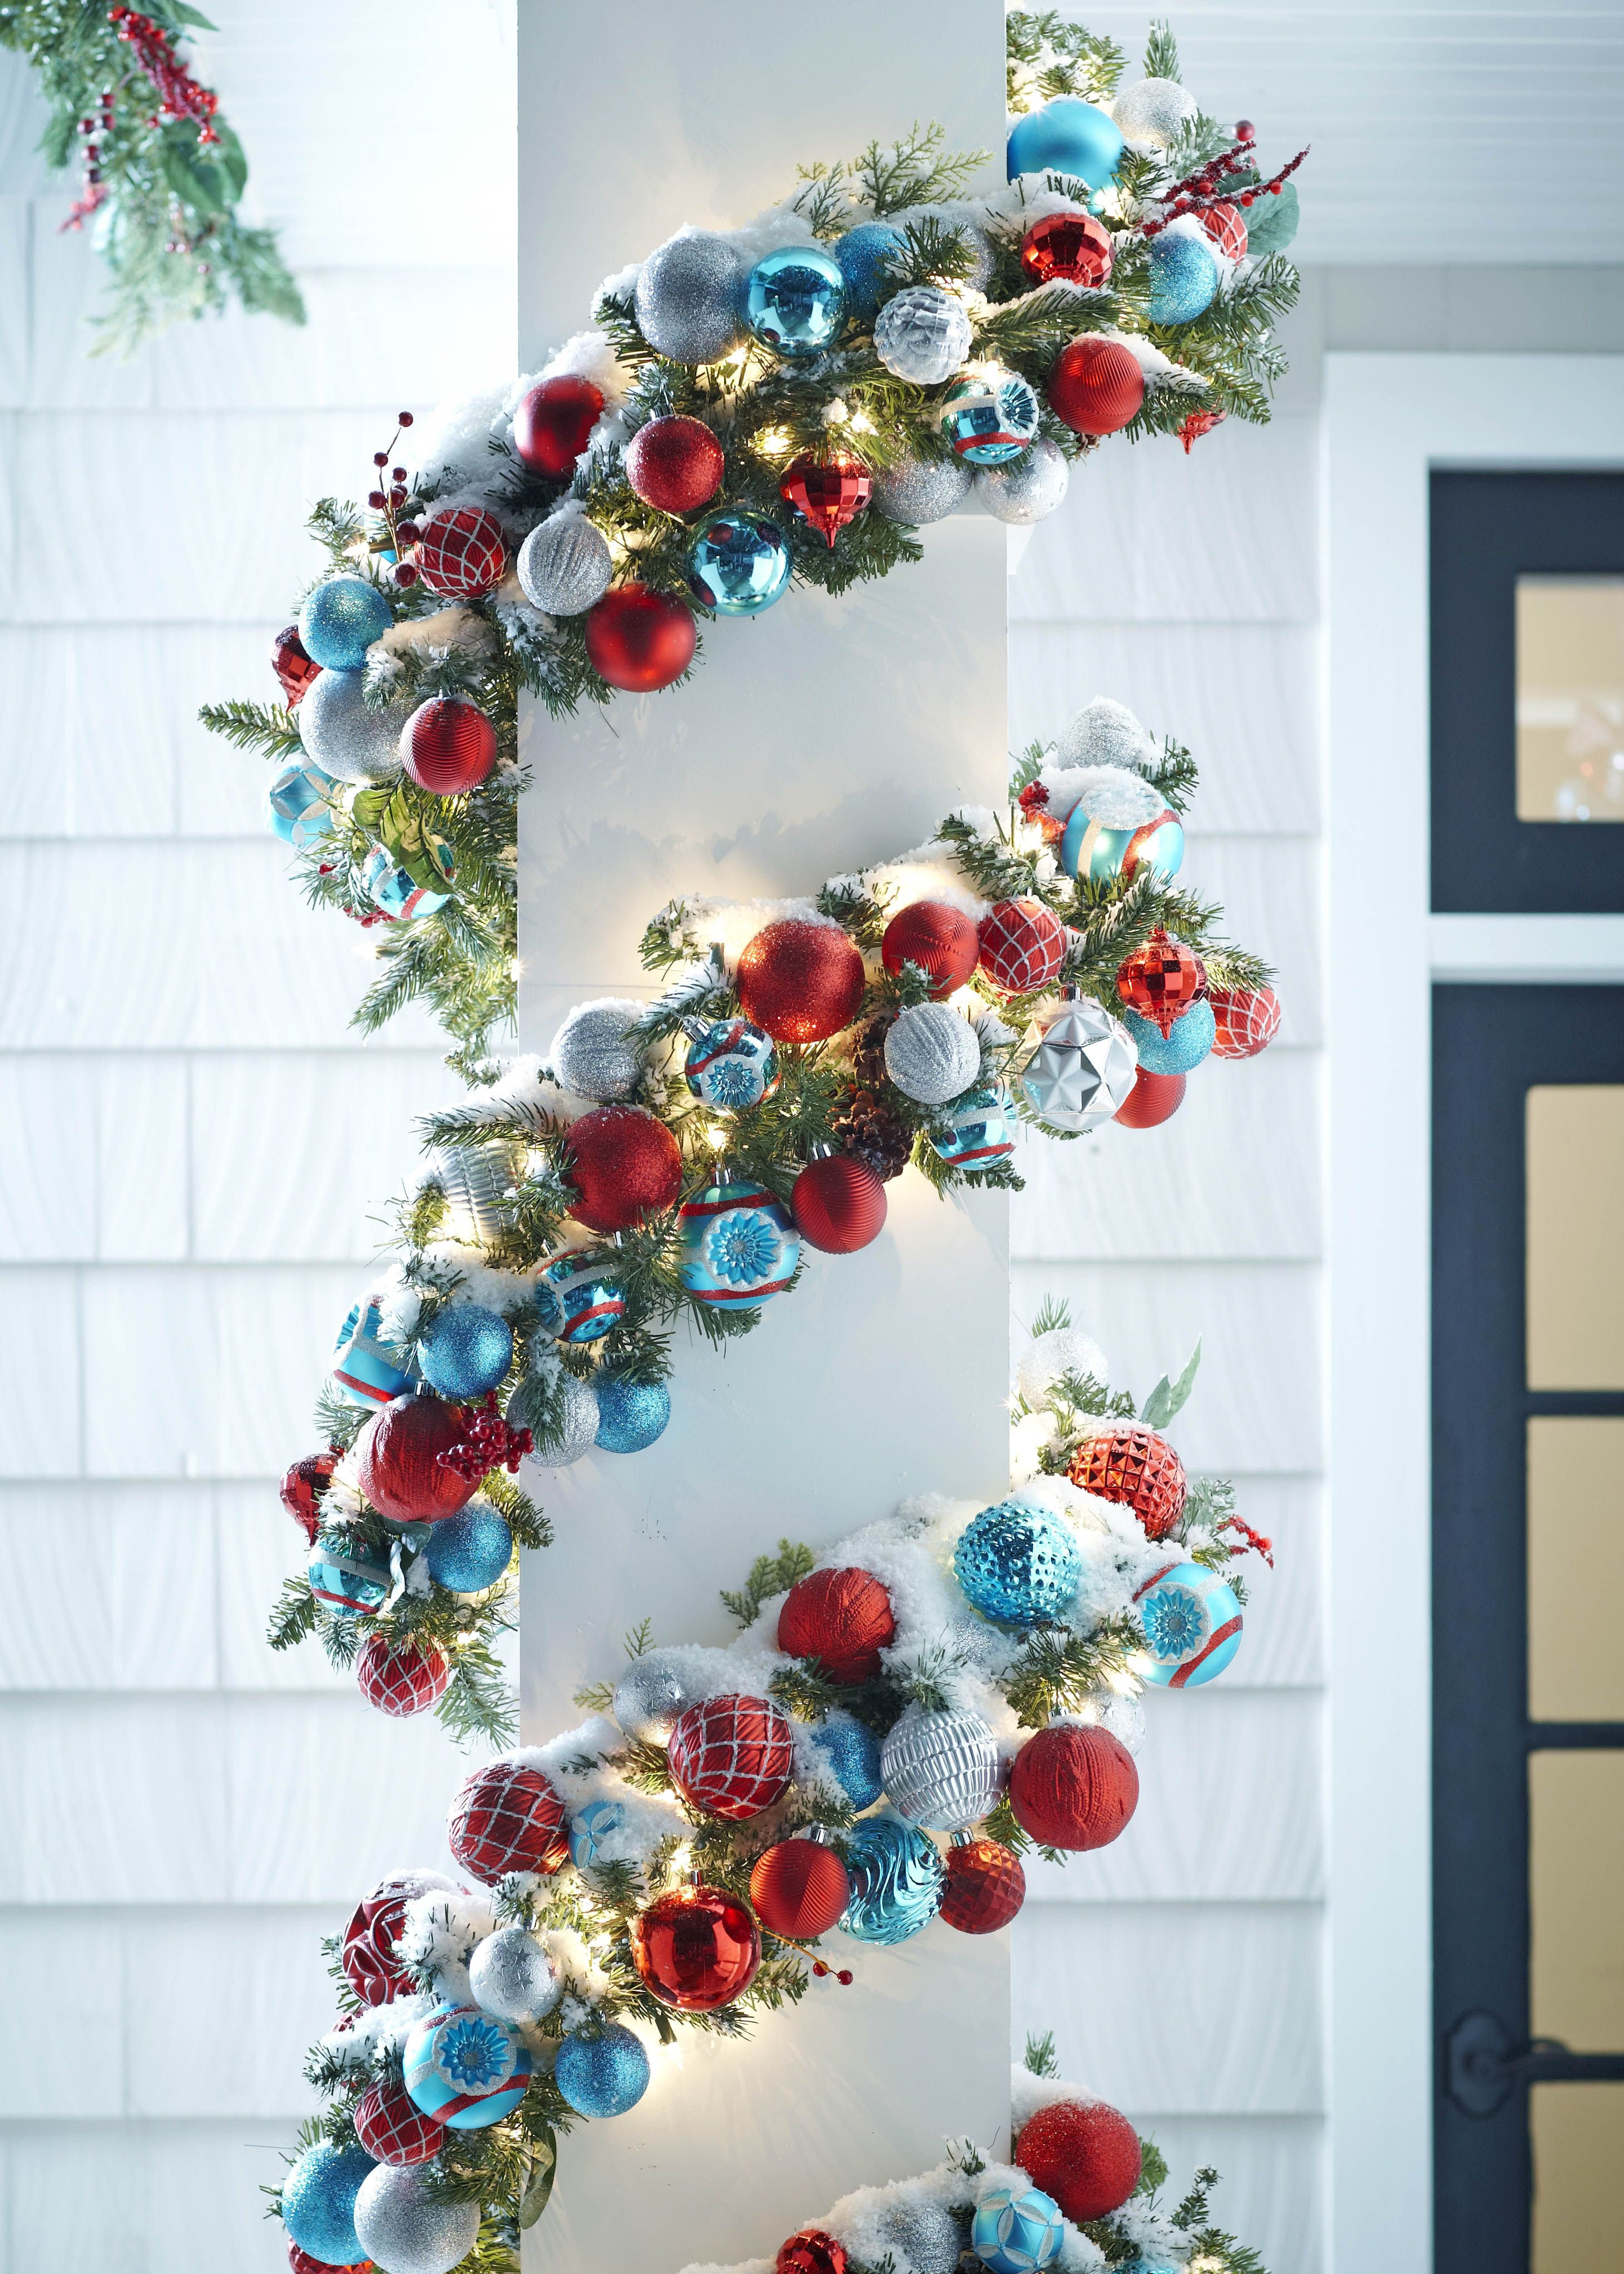 Diy outdoor christmas decorations  Decorating Your Home with Elegant Christmas Decorations  Holiday